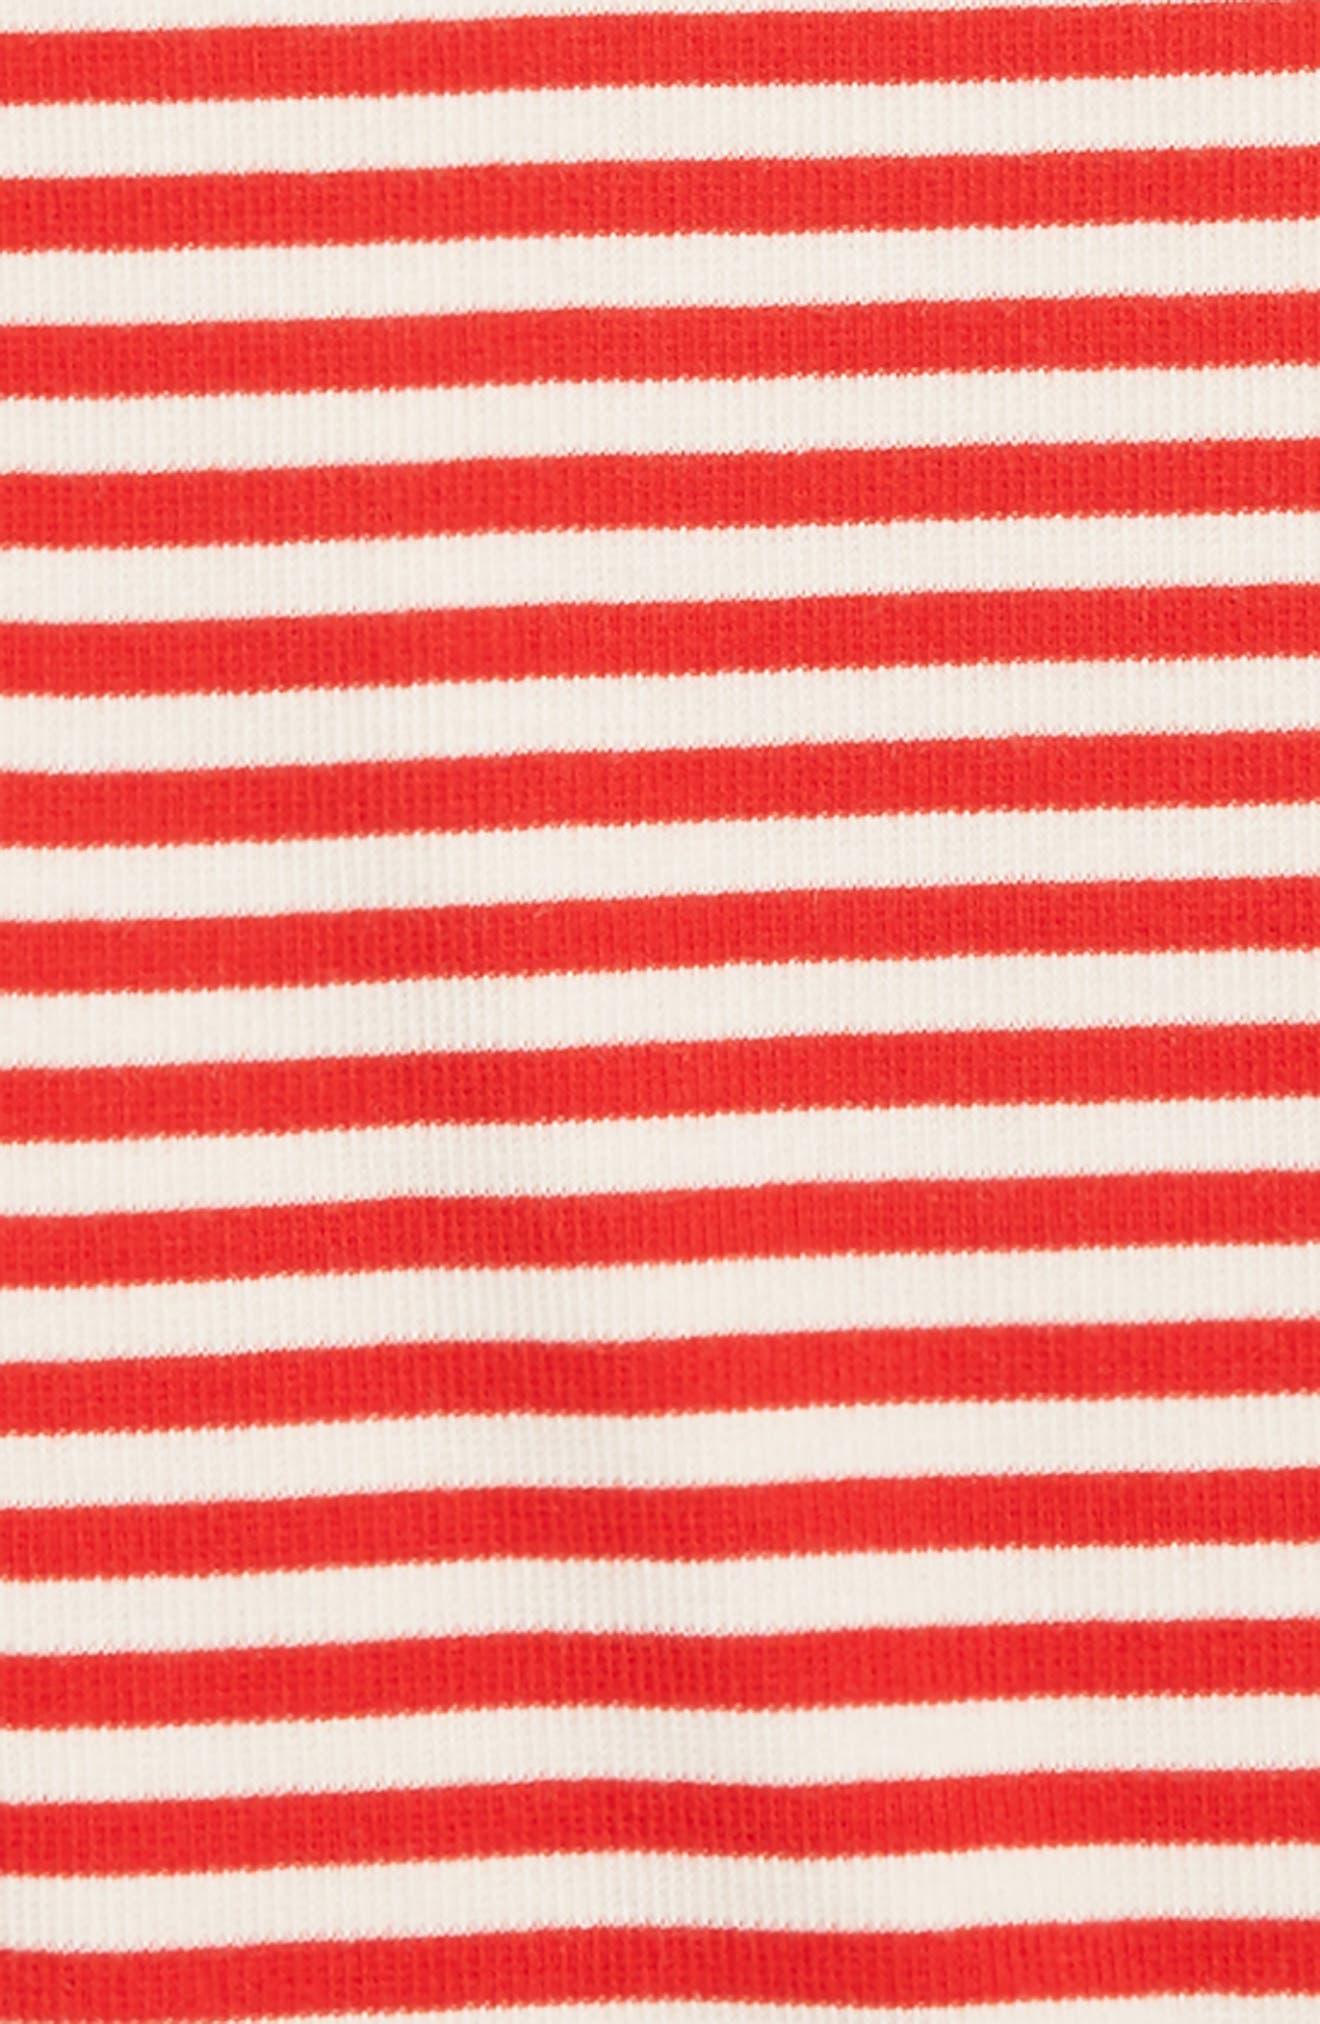 Rib Knit Top,                             Alternate thumbnail 2, color,                             RED PEPPER STRIPE